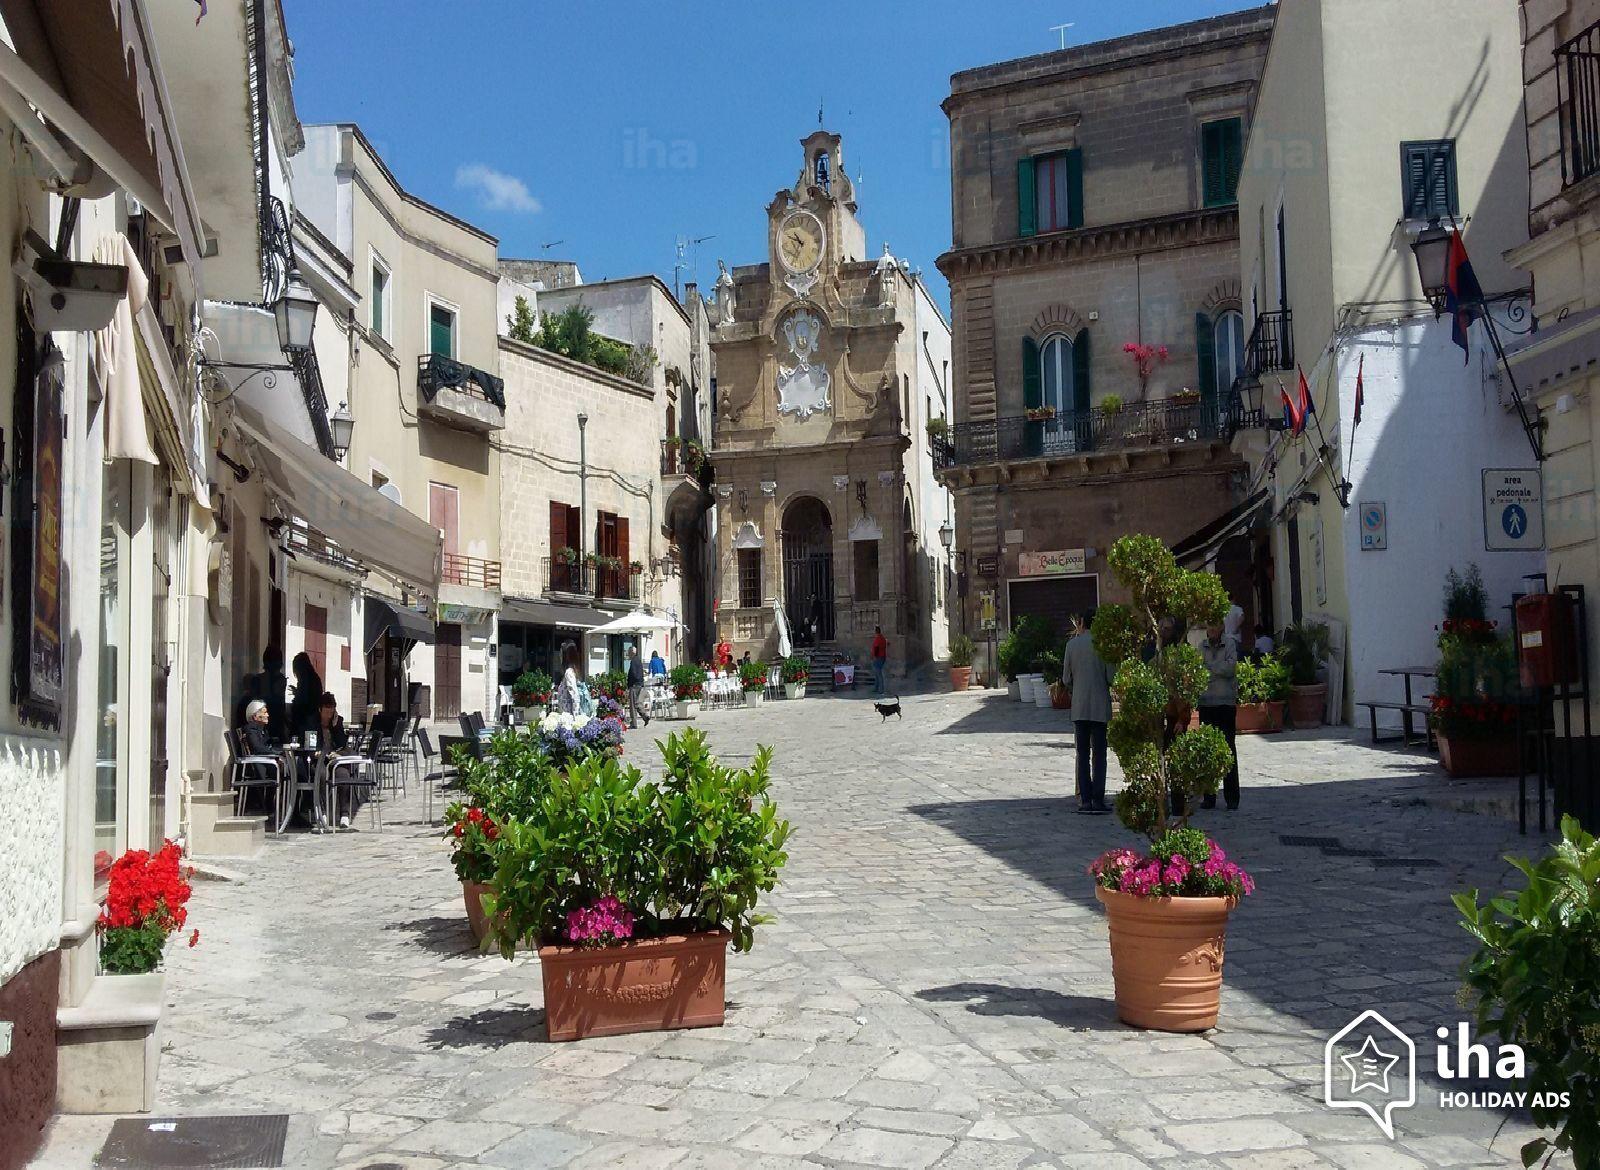 Oria centro storico vacanze